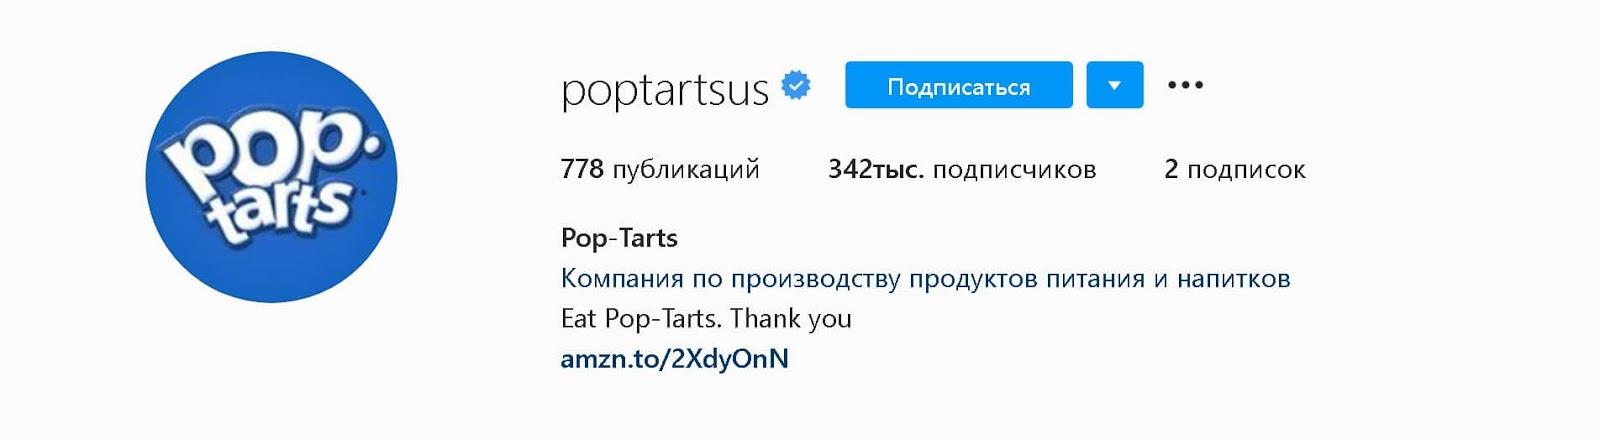 instagram-bios-pop-tarts